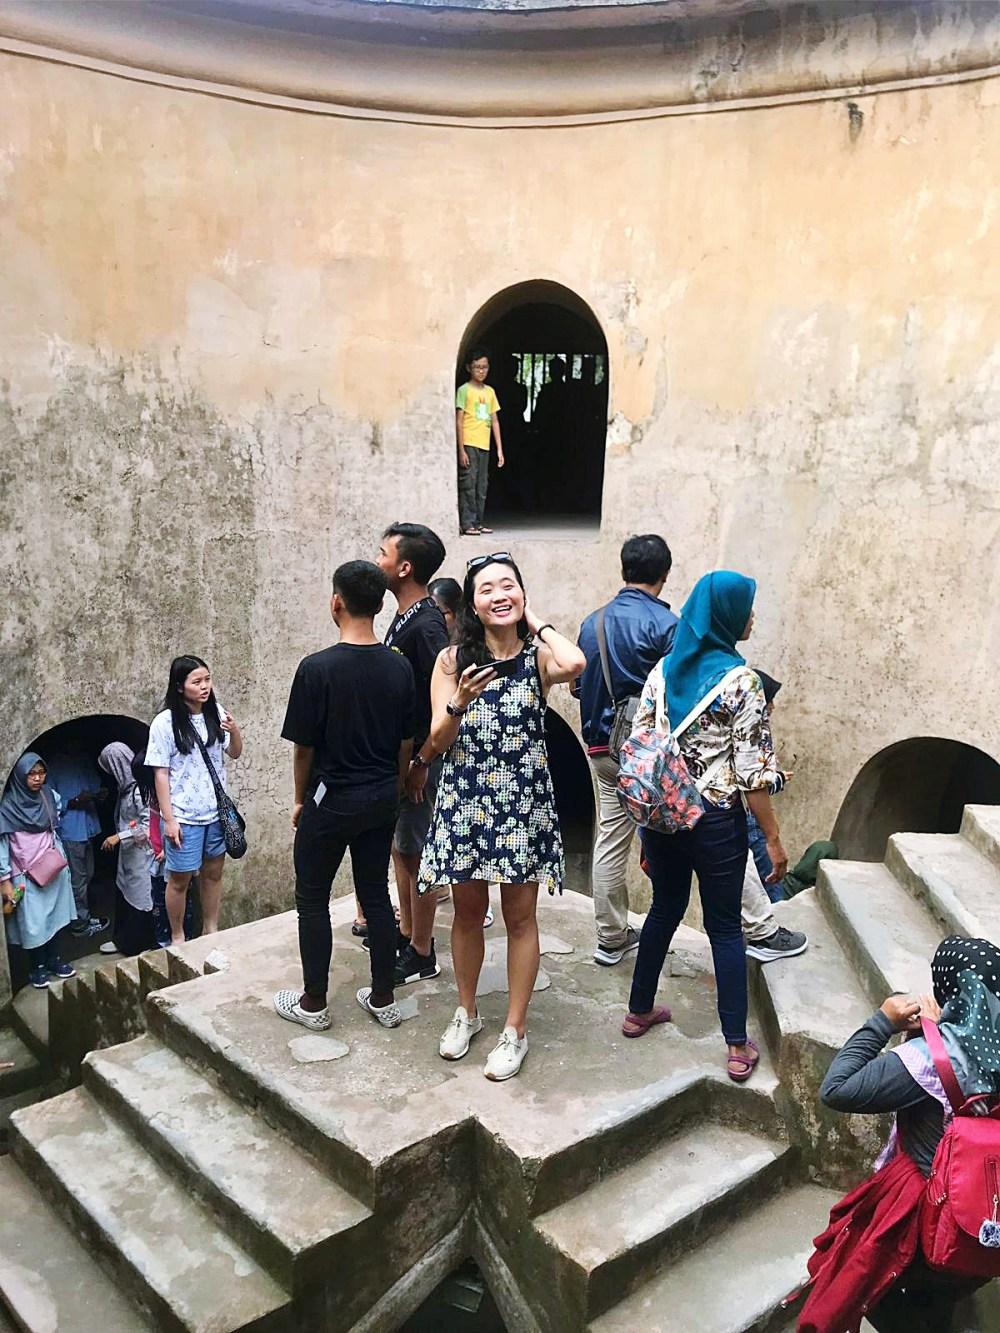 27 Dec 2018: Taman Sari | Yogyakarta, Indonesia